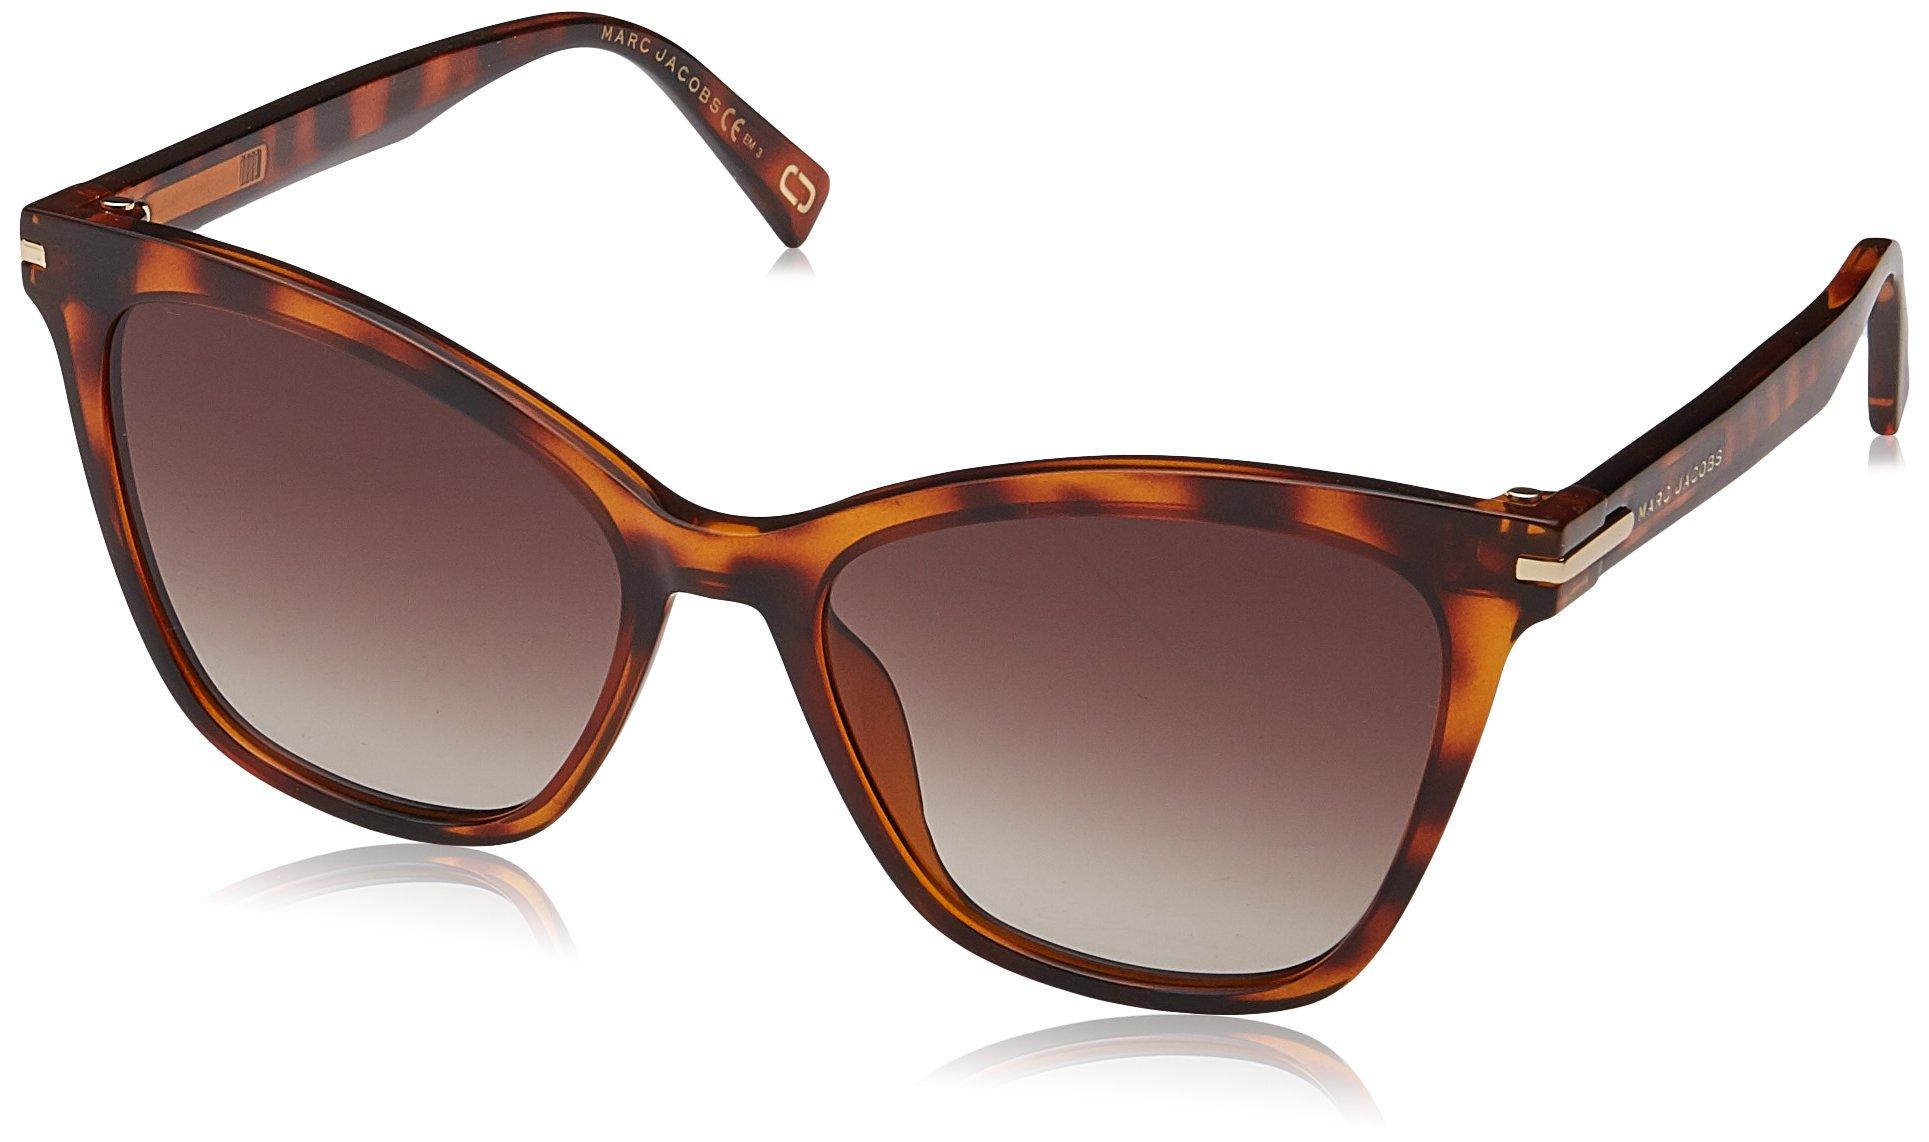 Marc Jacobs Women's Flat Top Sunglasses, Havana Black/Back, One Size